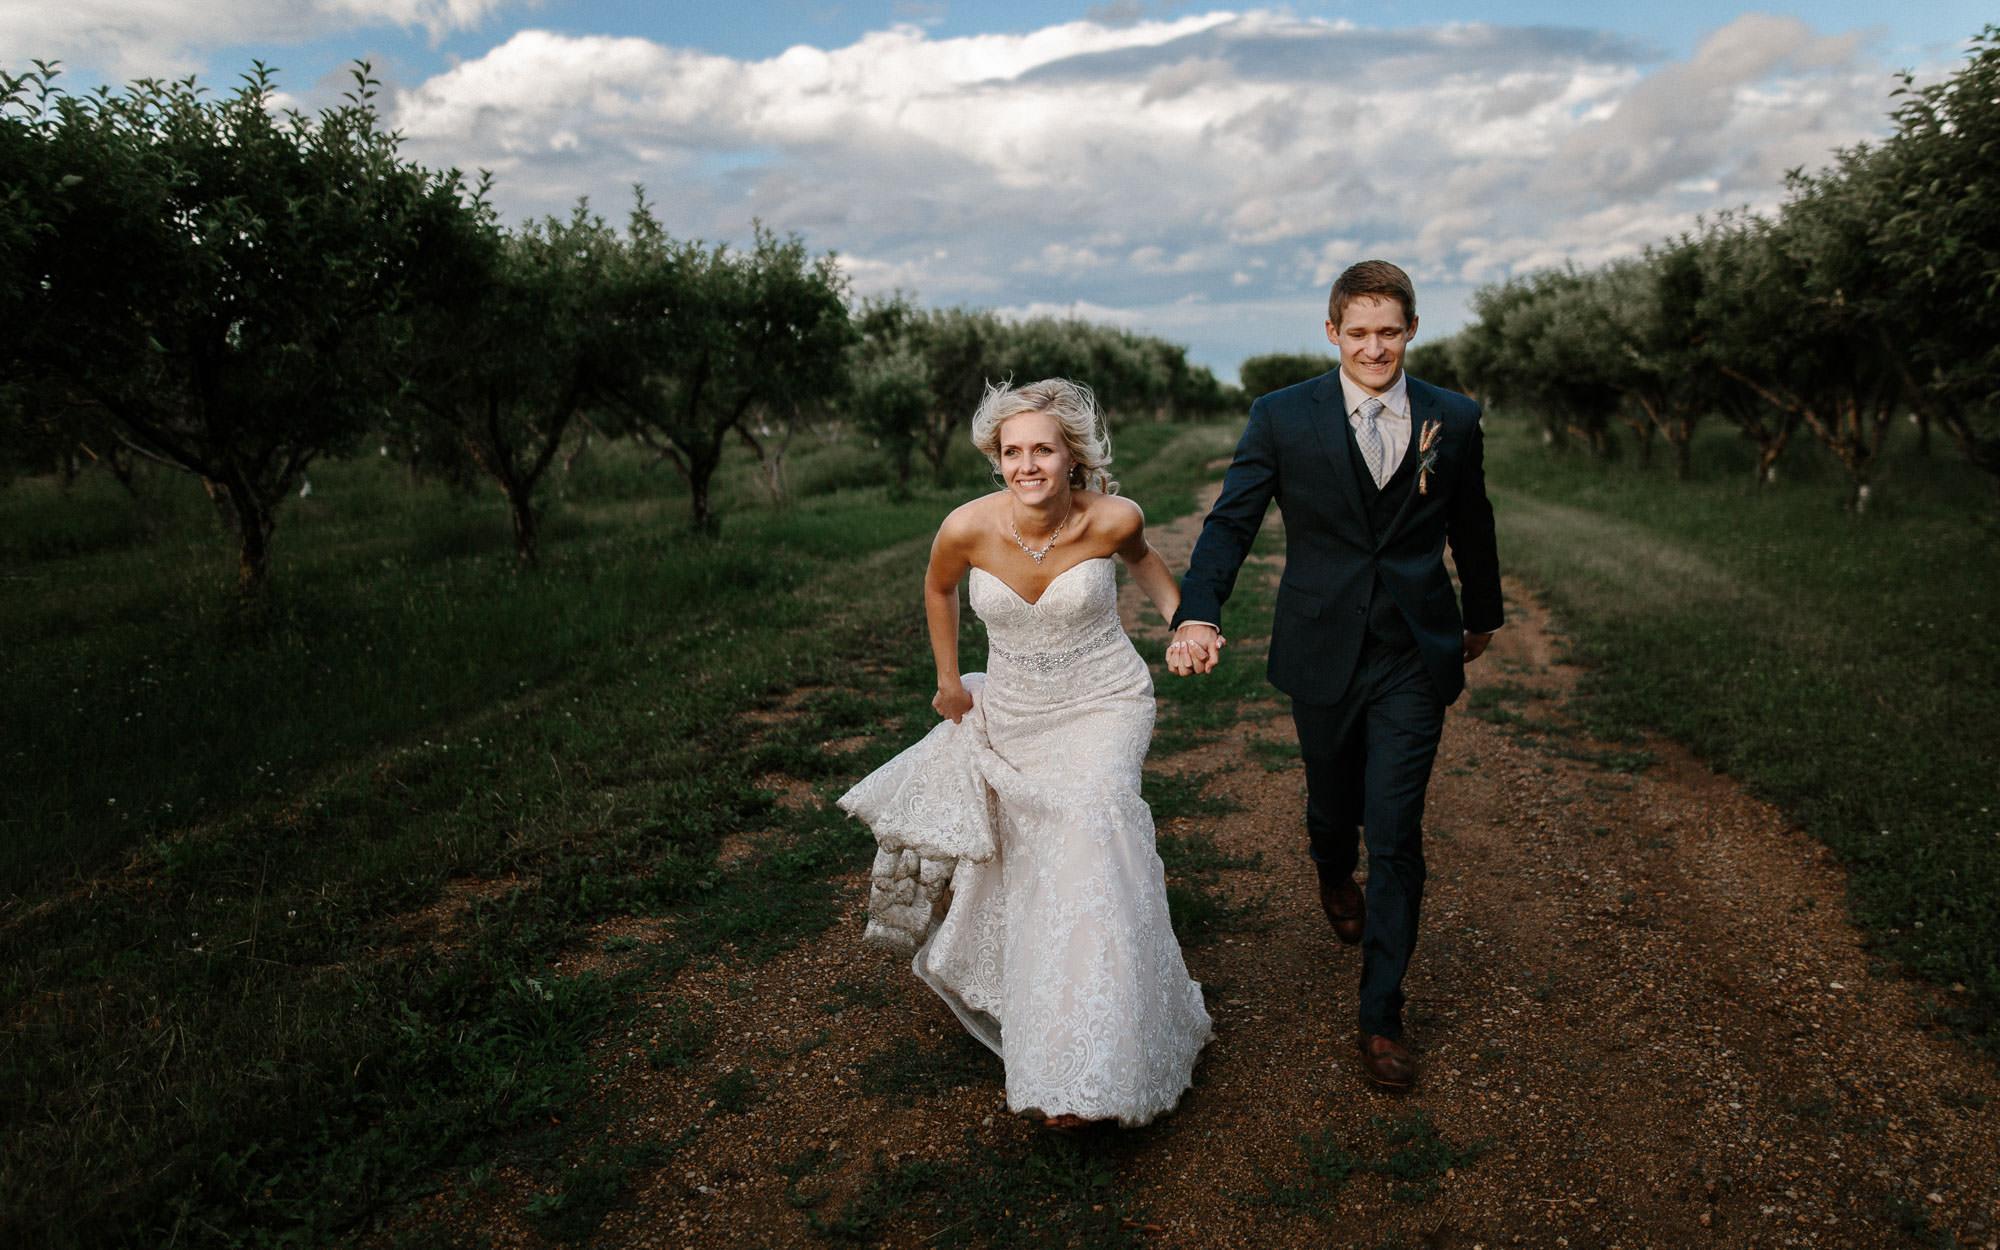 meadow-barn-wedding-sioux-falls-south-dakota-romantic-adventerous-michael-liedtke-photography103.jpg